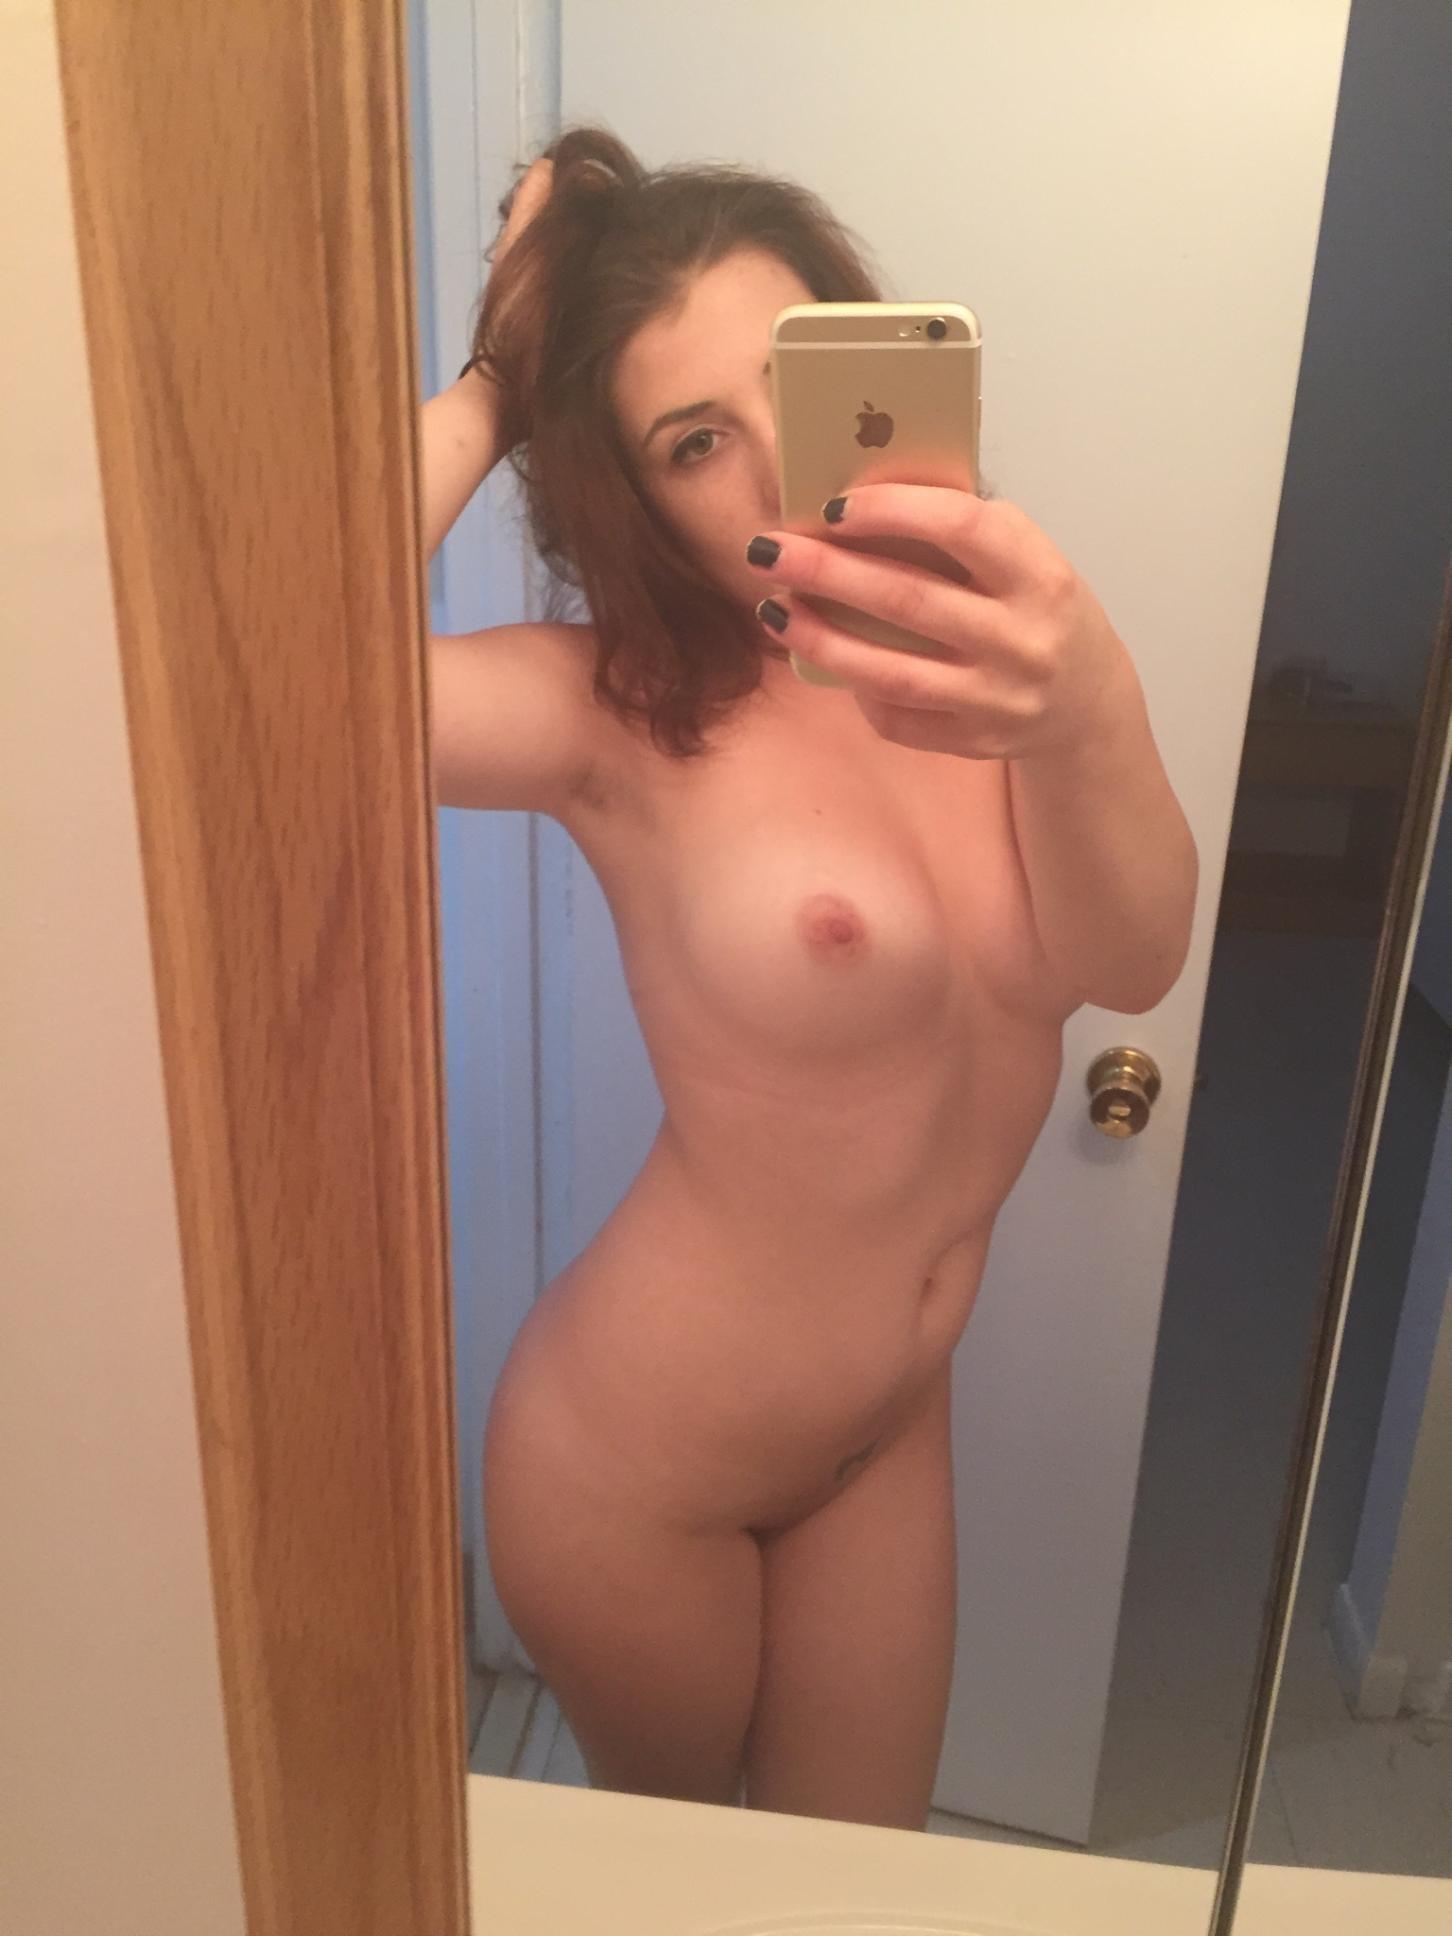 selfie-naked-girls-selfshot-amateur-mix-vol5-77